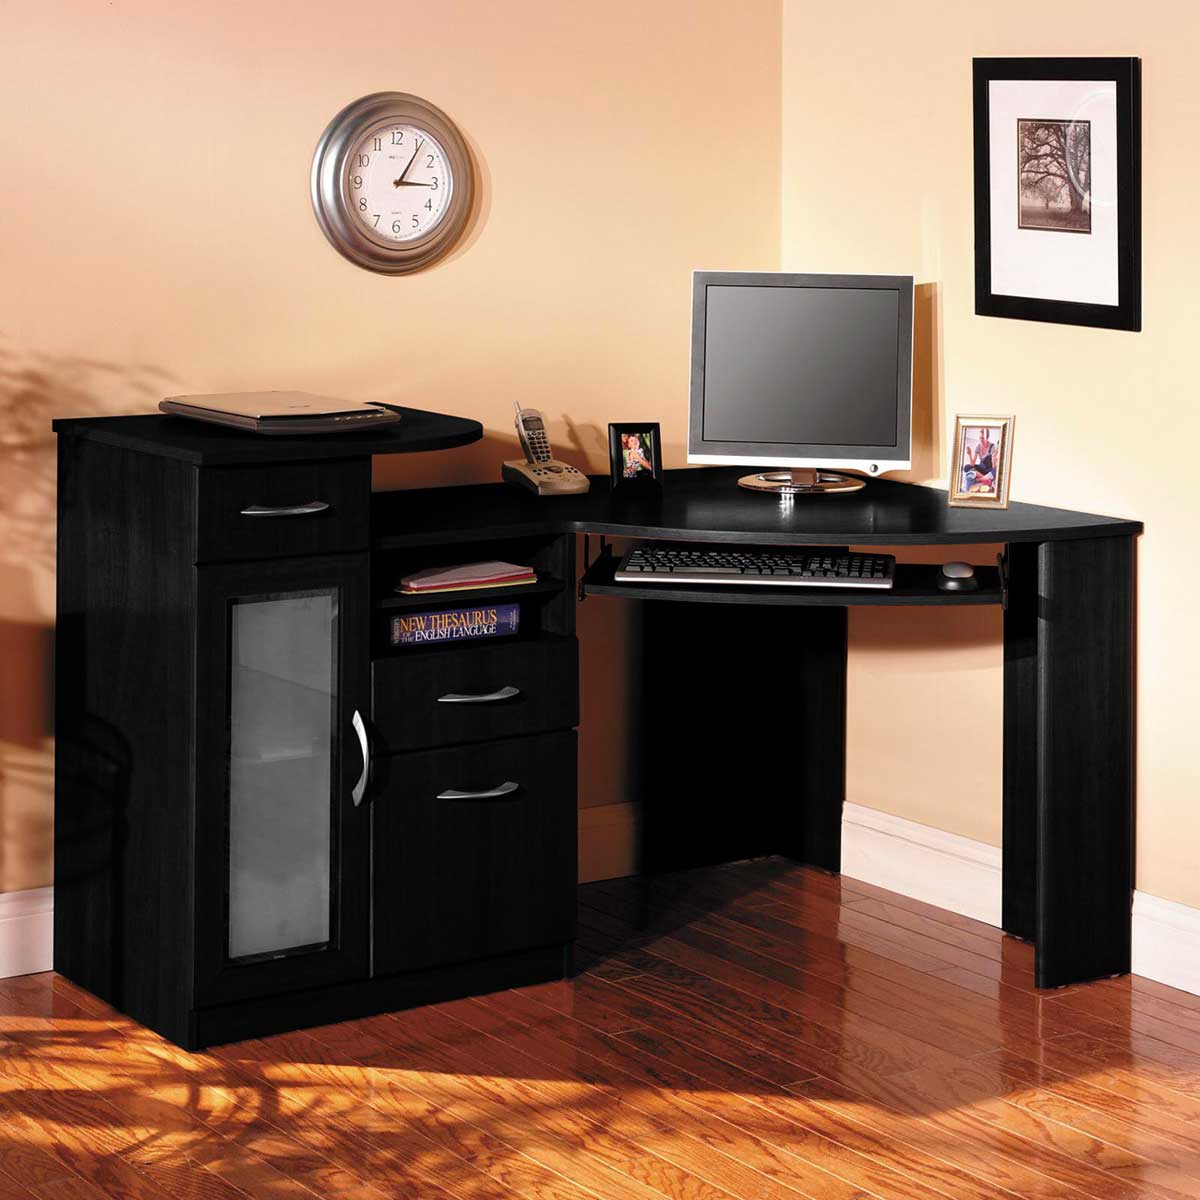 Cheap Corner Desks: Budget Friendly and Room Beautifier ...